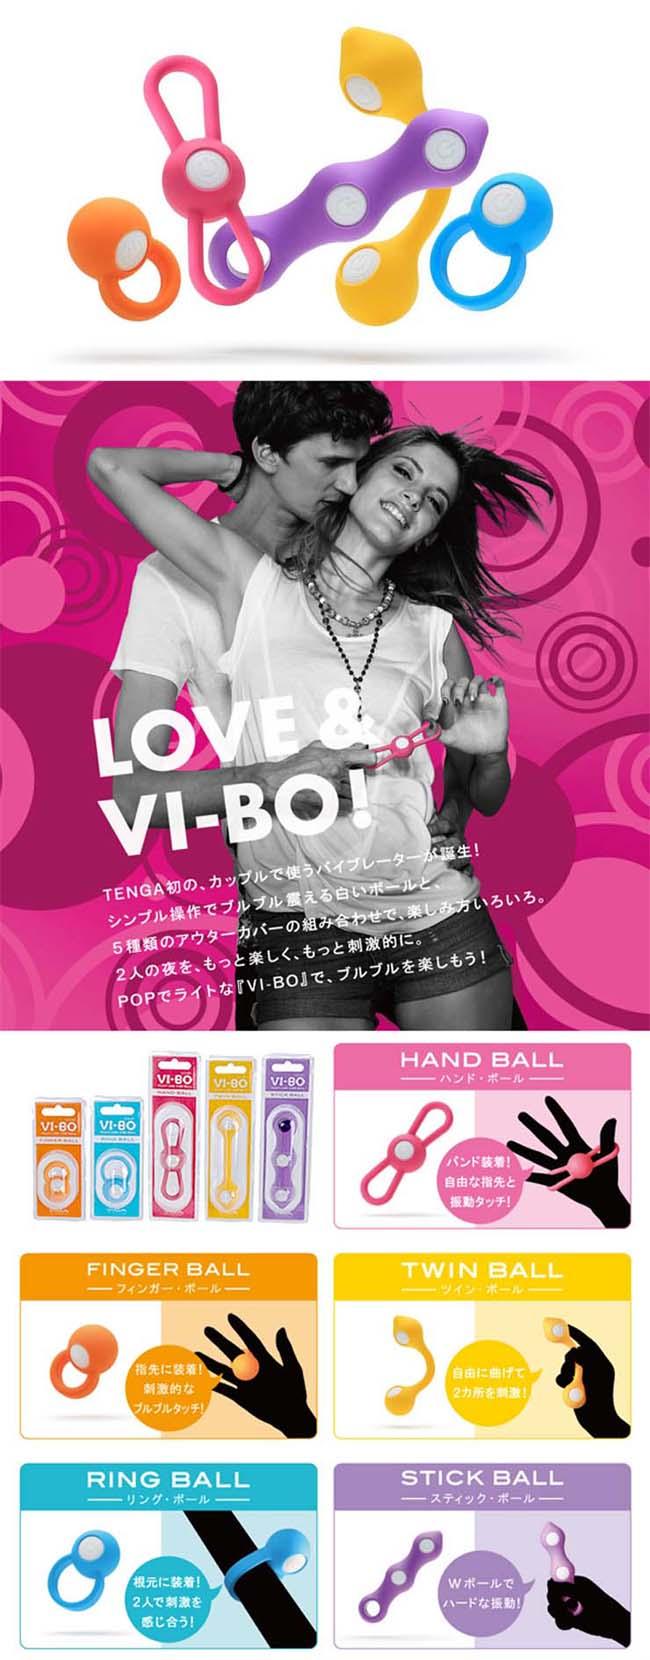 按摩棒-日本TENGA VI-BO球棒 VI-BO STICK BALL